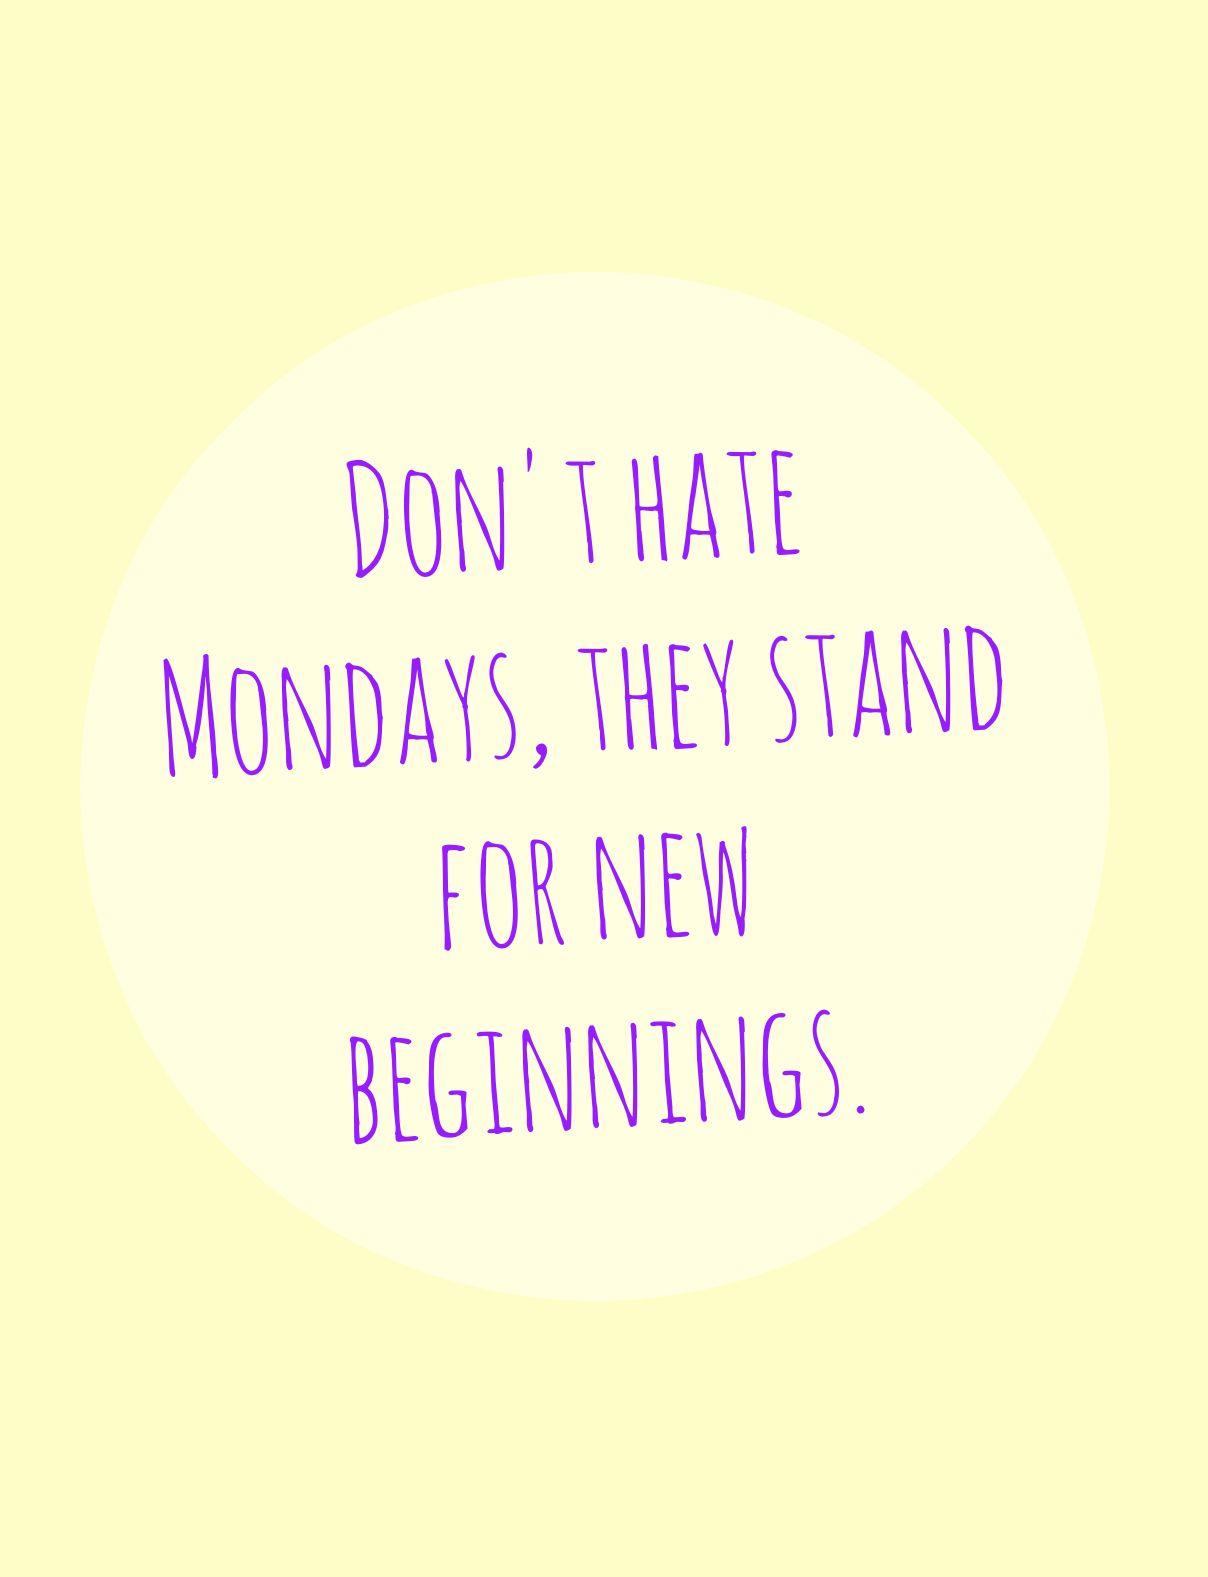 Good Morning! New day, new week, new month = fresh start ...